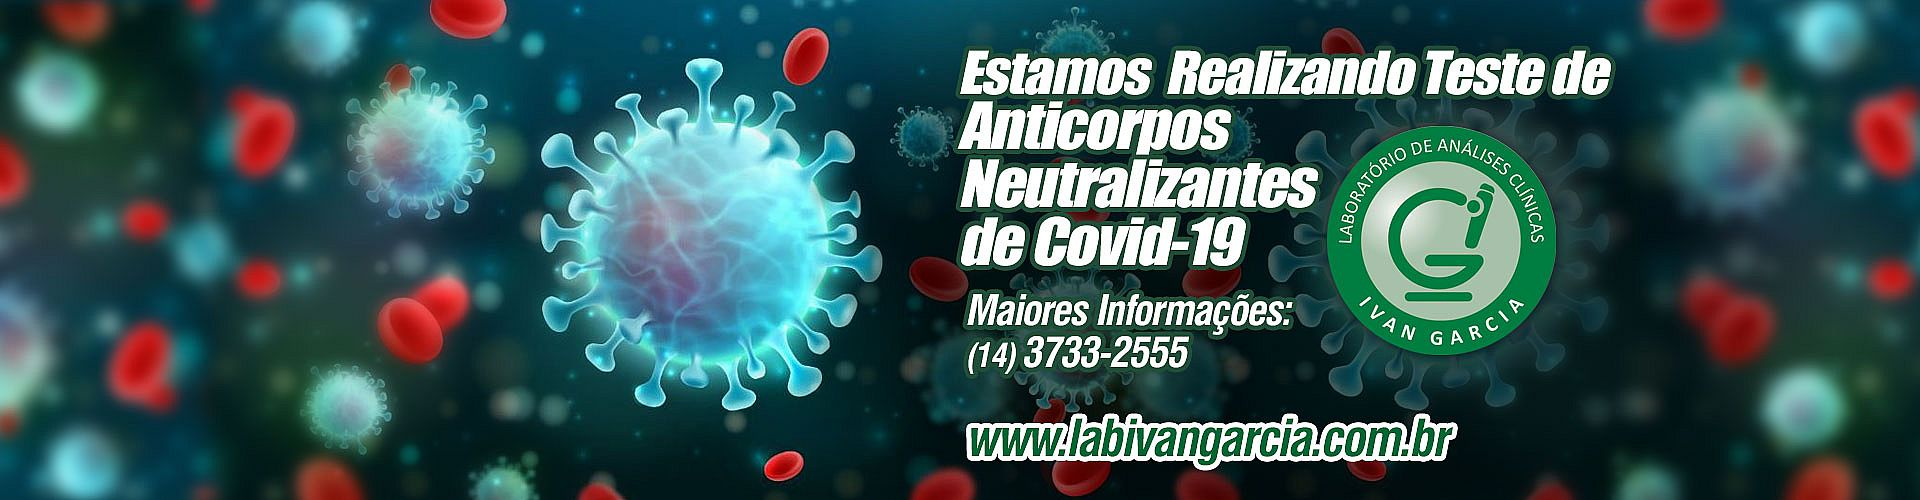 Teste de Anticorpos Neutralizantes de Covid-19